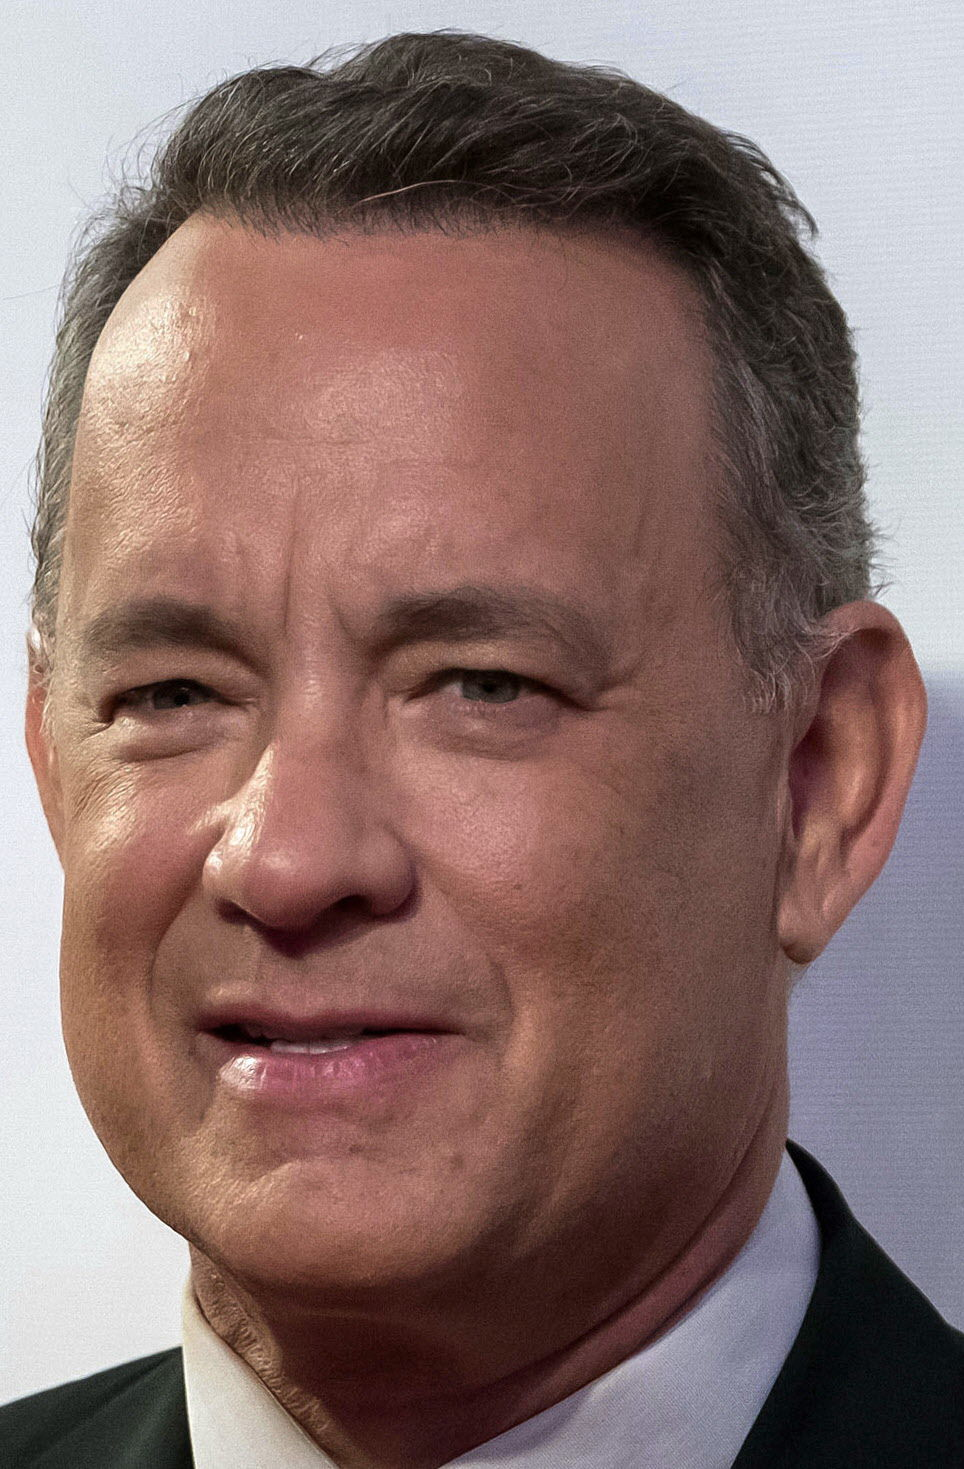 Tom Hanks to star in new World War II movie filming in Baton Rouge